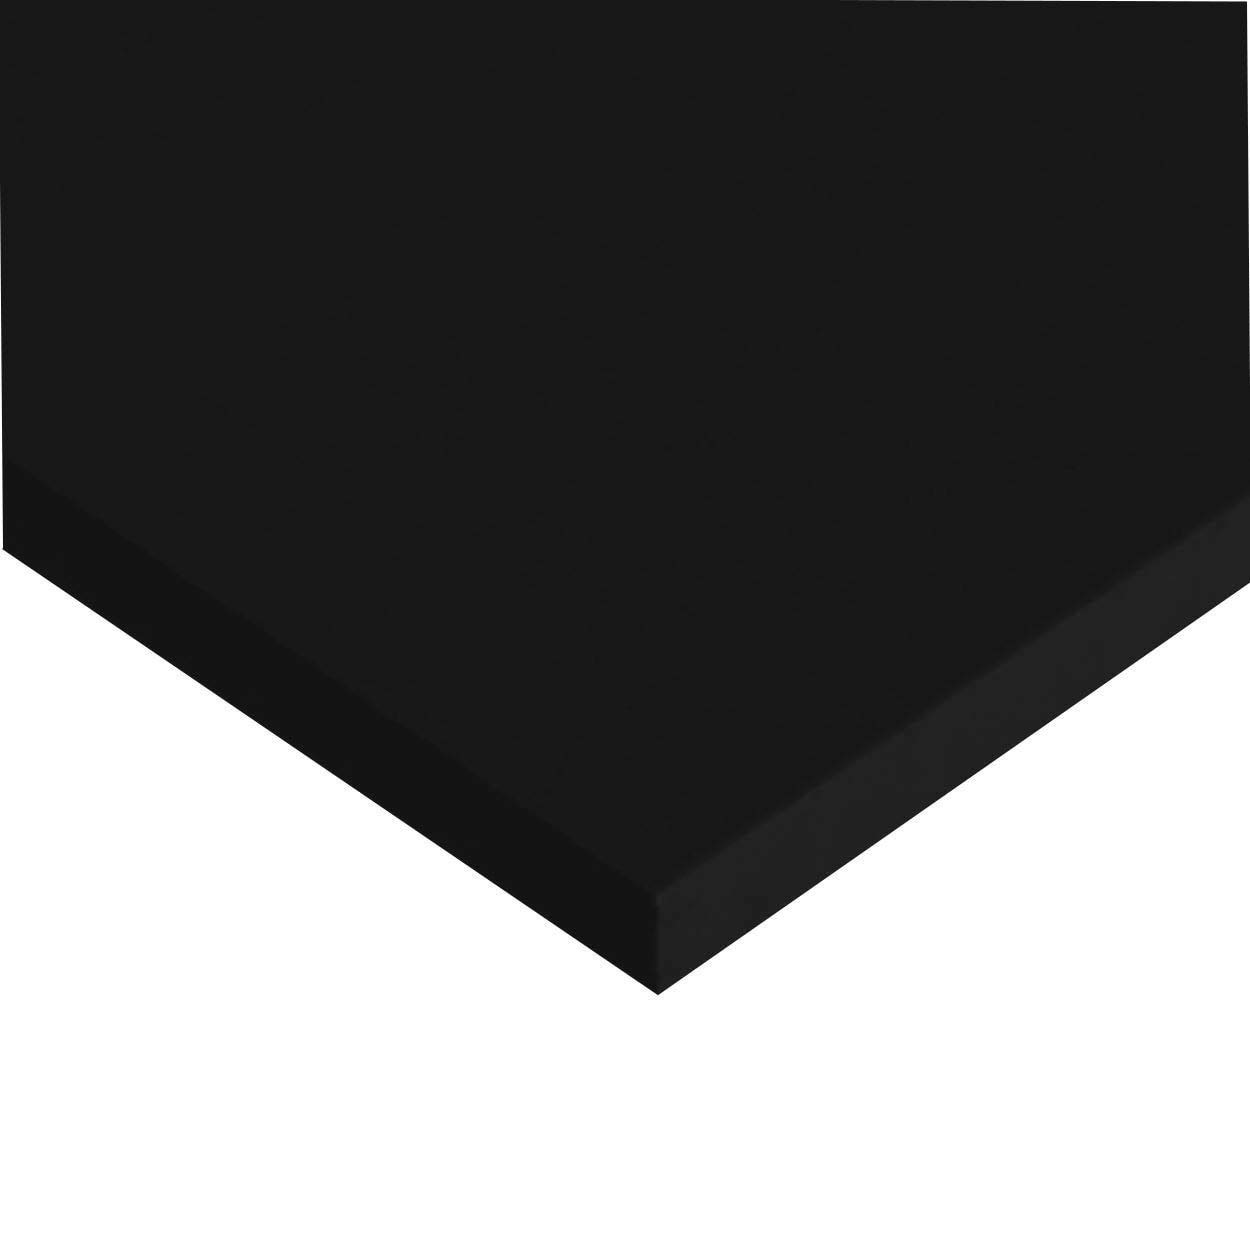 Online Metal Supply UHMW Polyethylene Sheet 0.500 x 18 x 24 Black